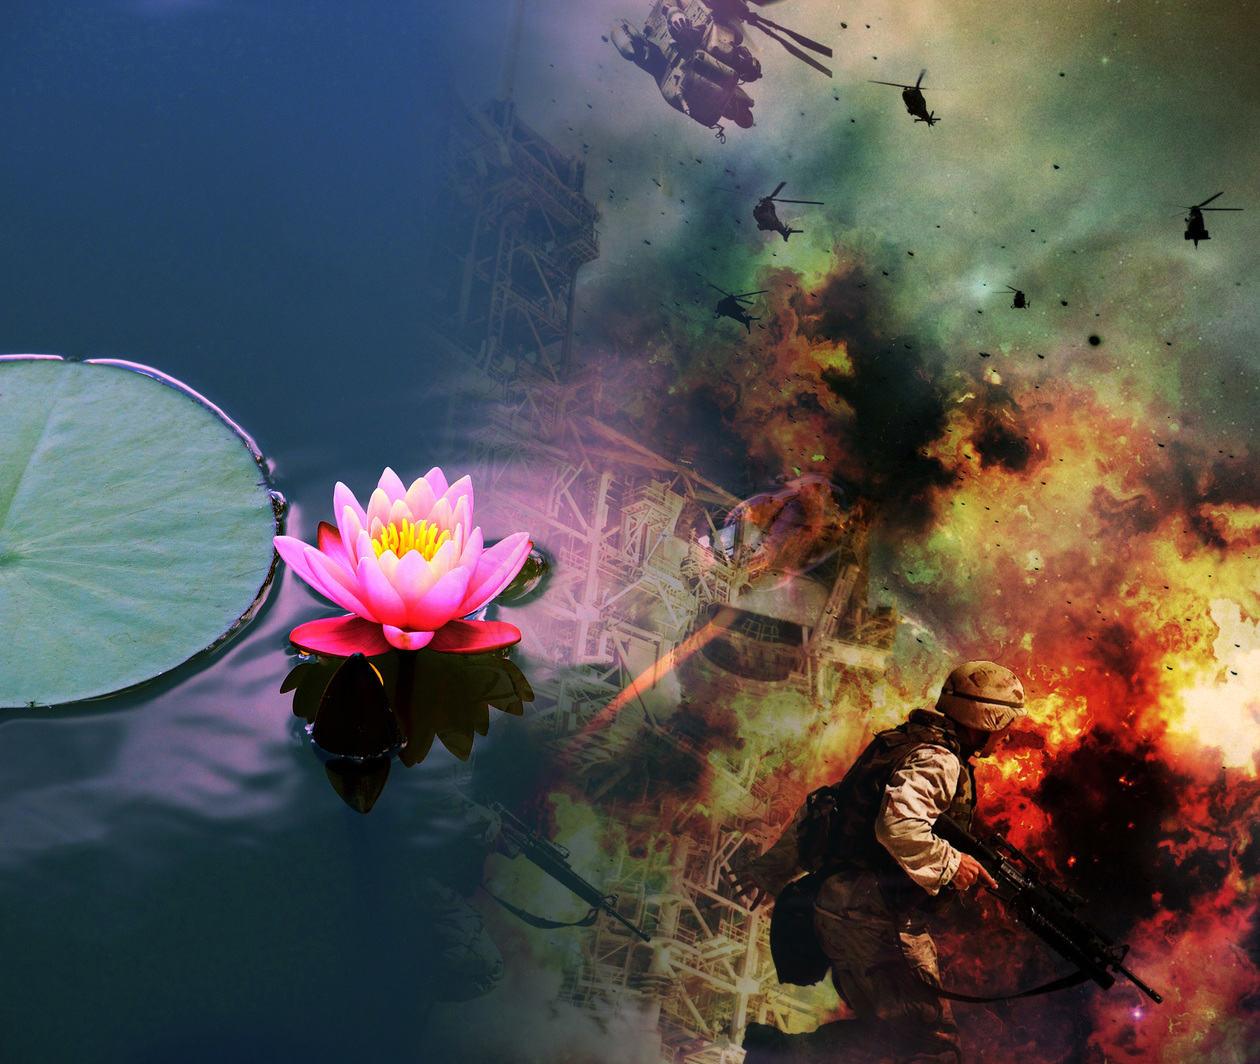 Buddhism: Diamond Sutra and World Peace